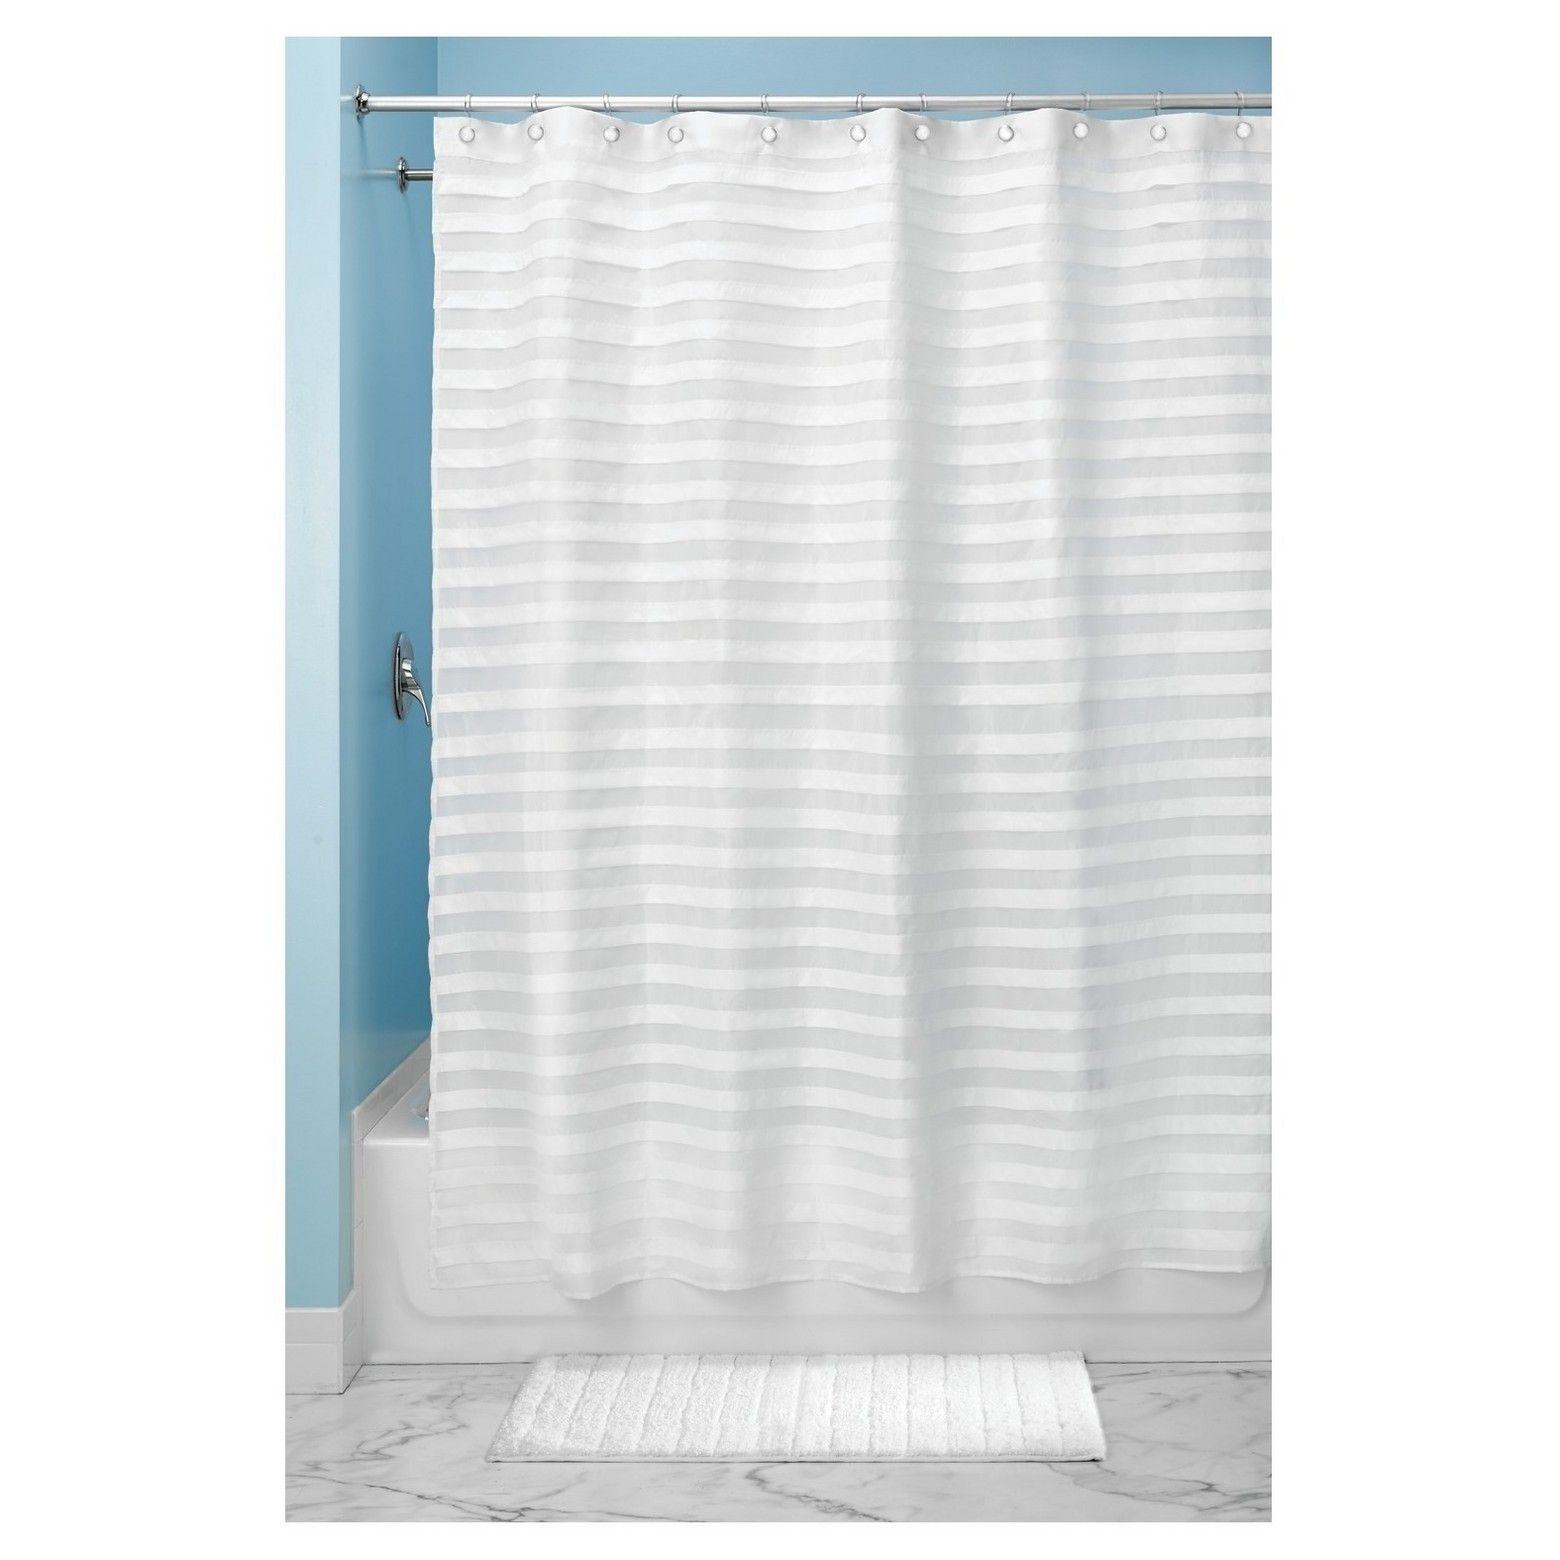 Tuxedo Shower Curtain White Interdesign Products I M